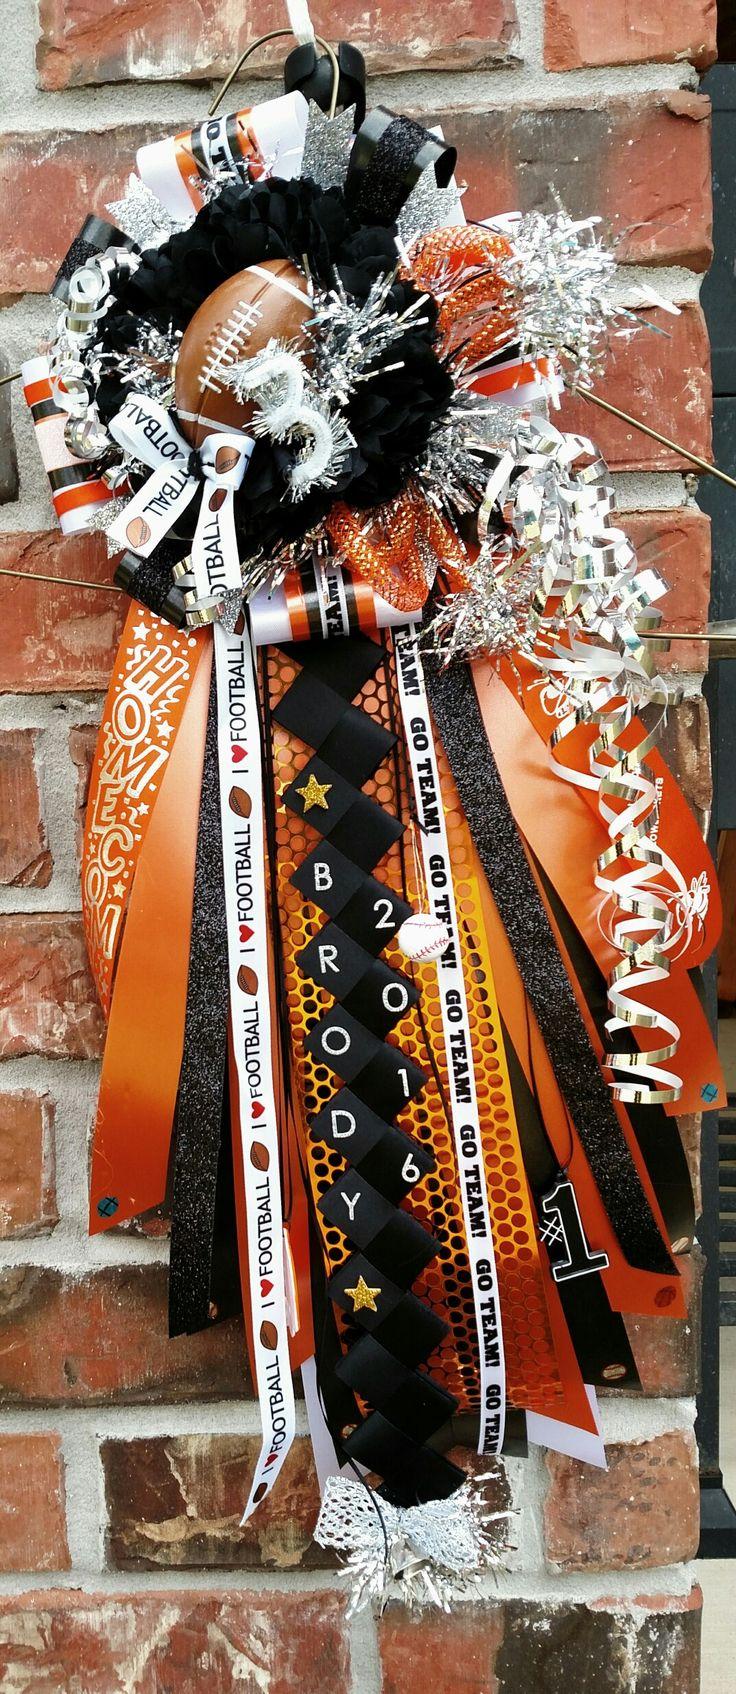 Boys Garter homecoming mum. Orange black white and silver homecoming mum. Designed by Crafty bug